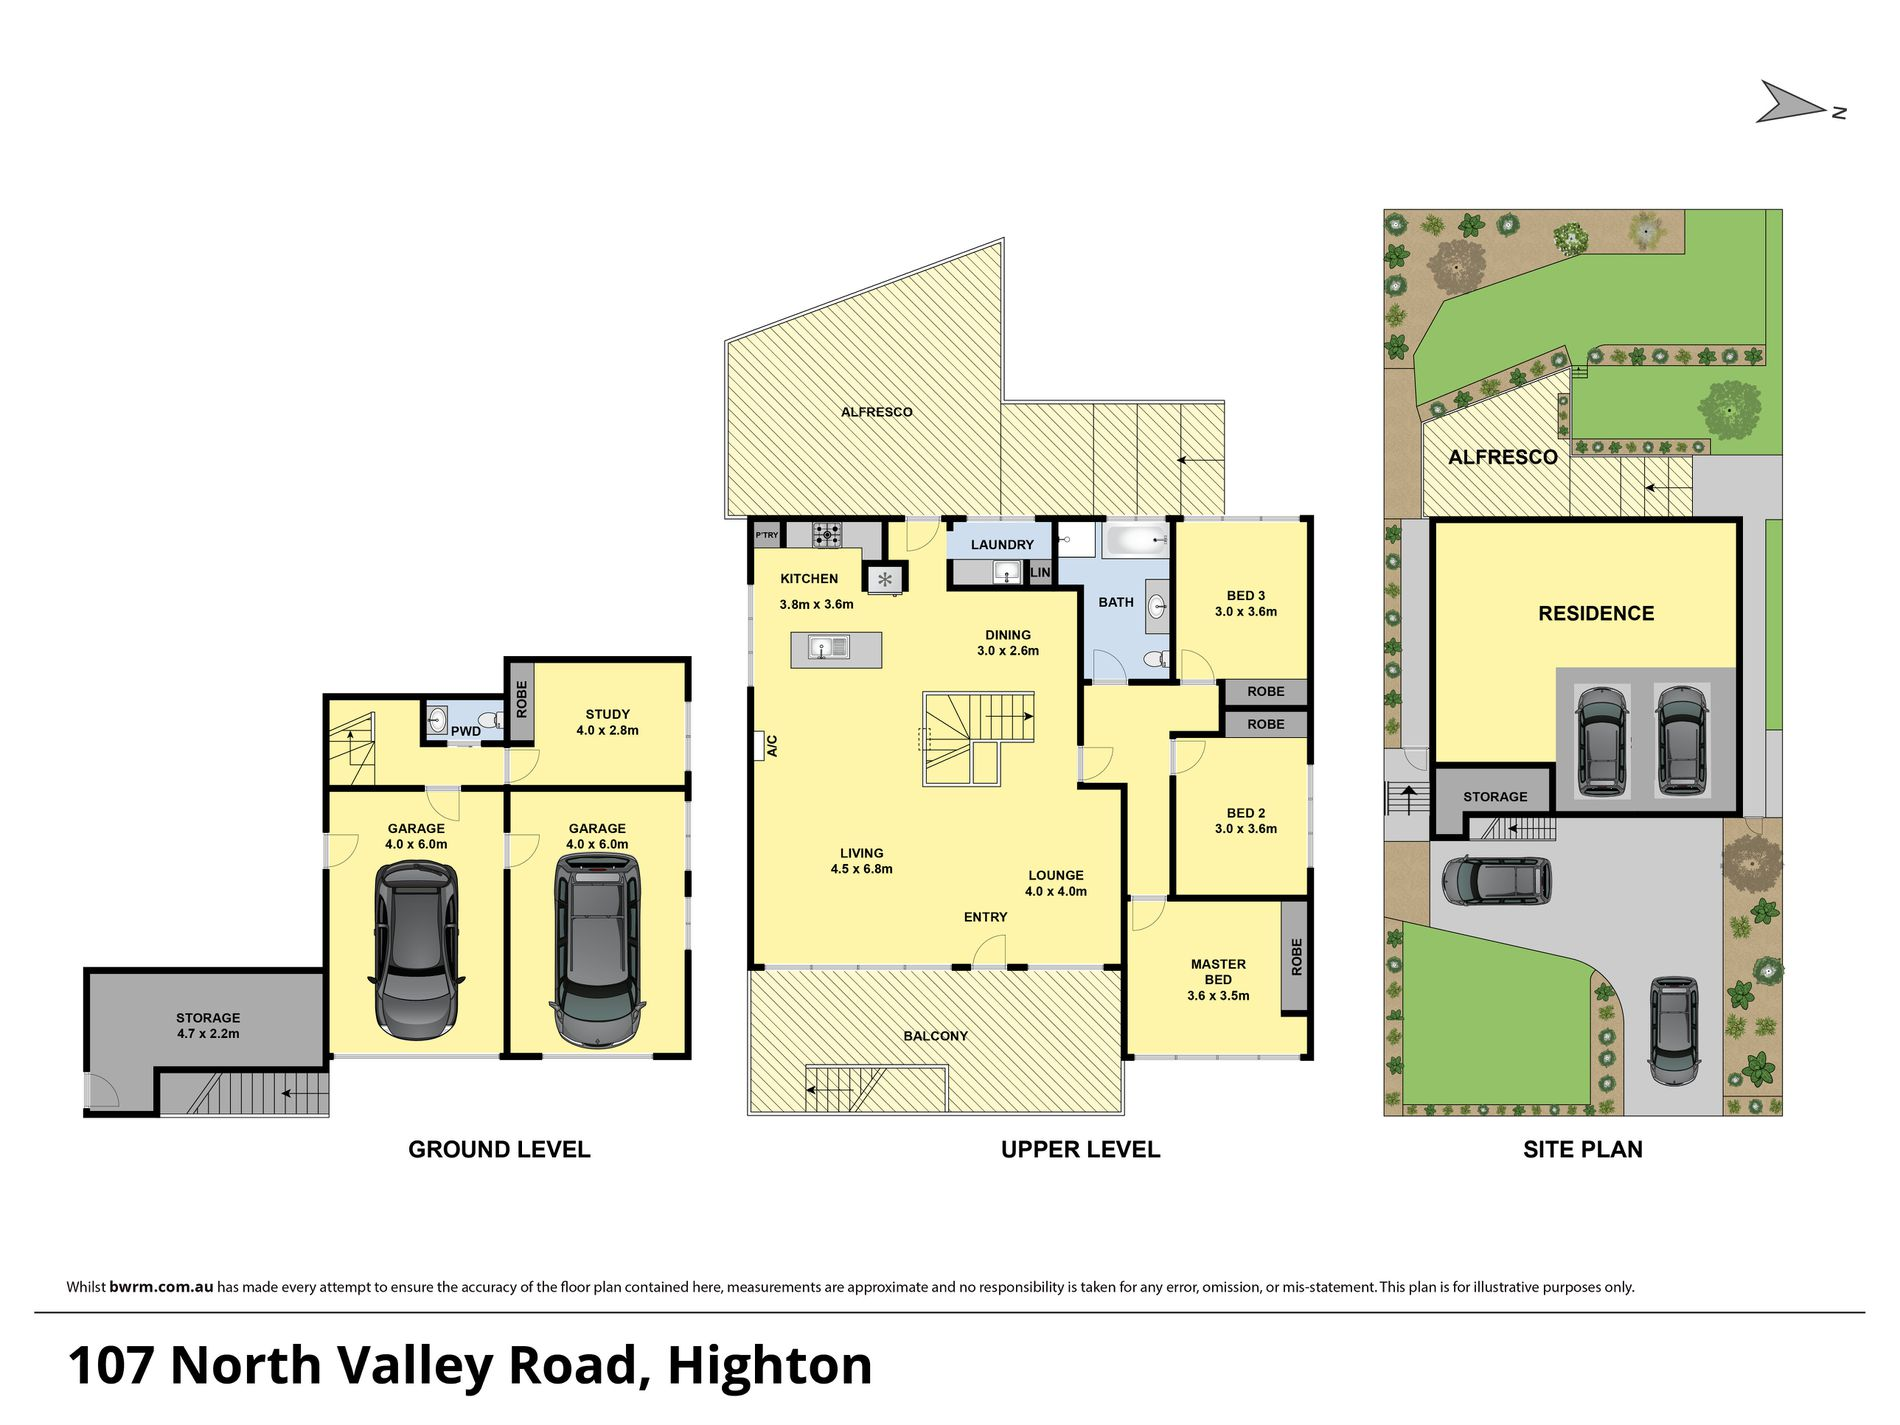 107 North Valley Road, Highton